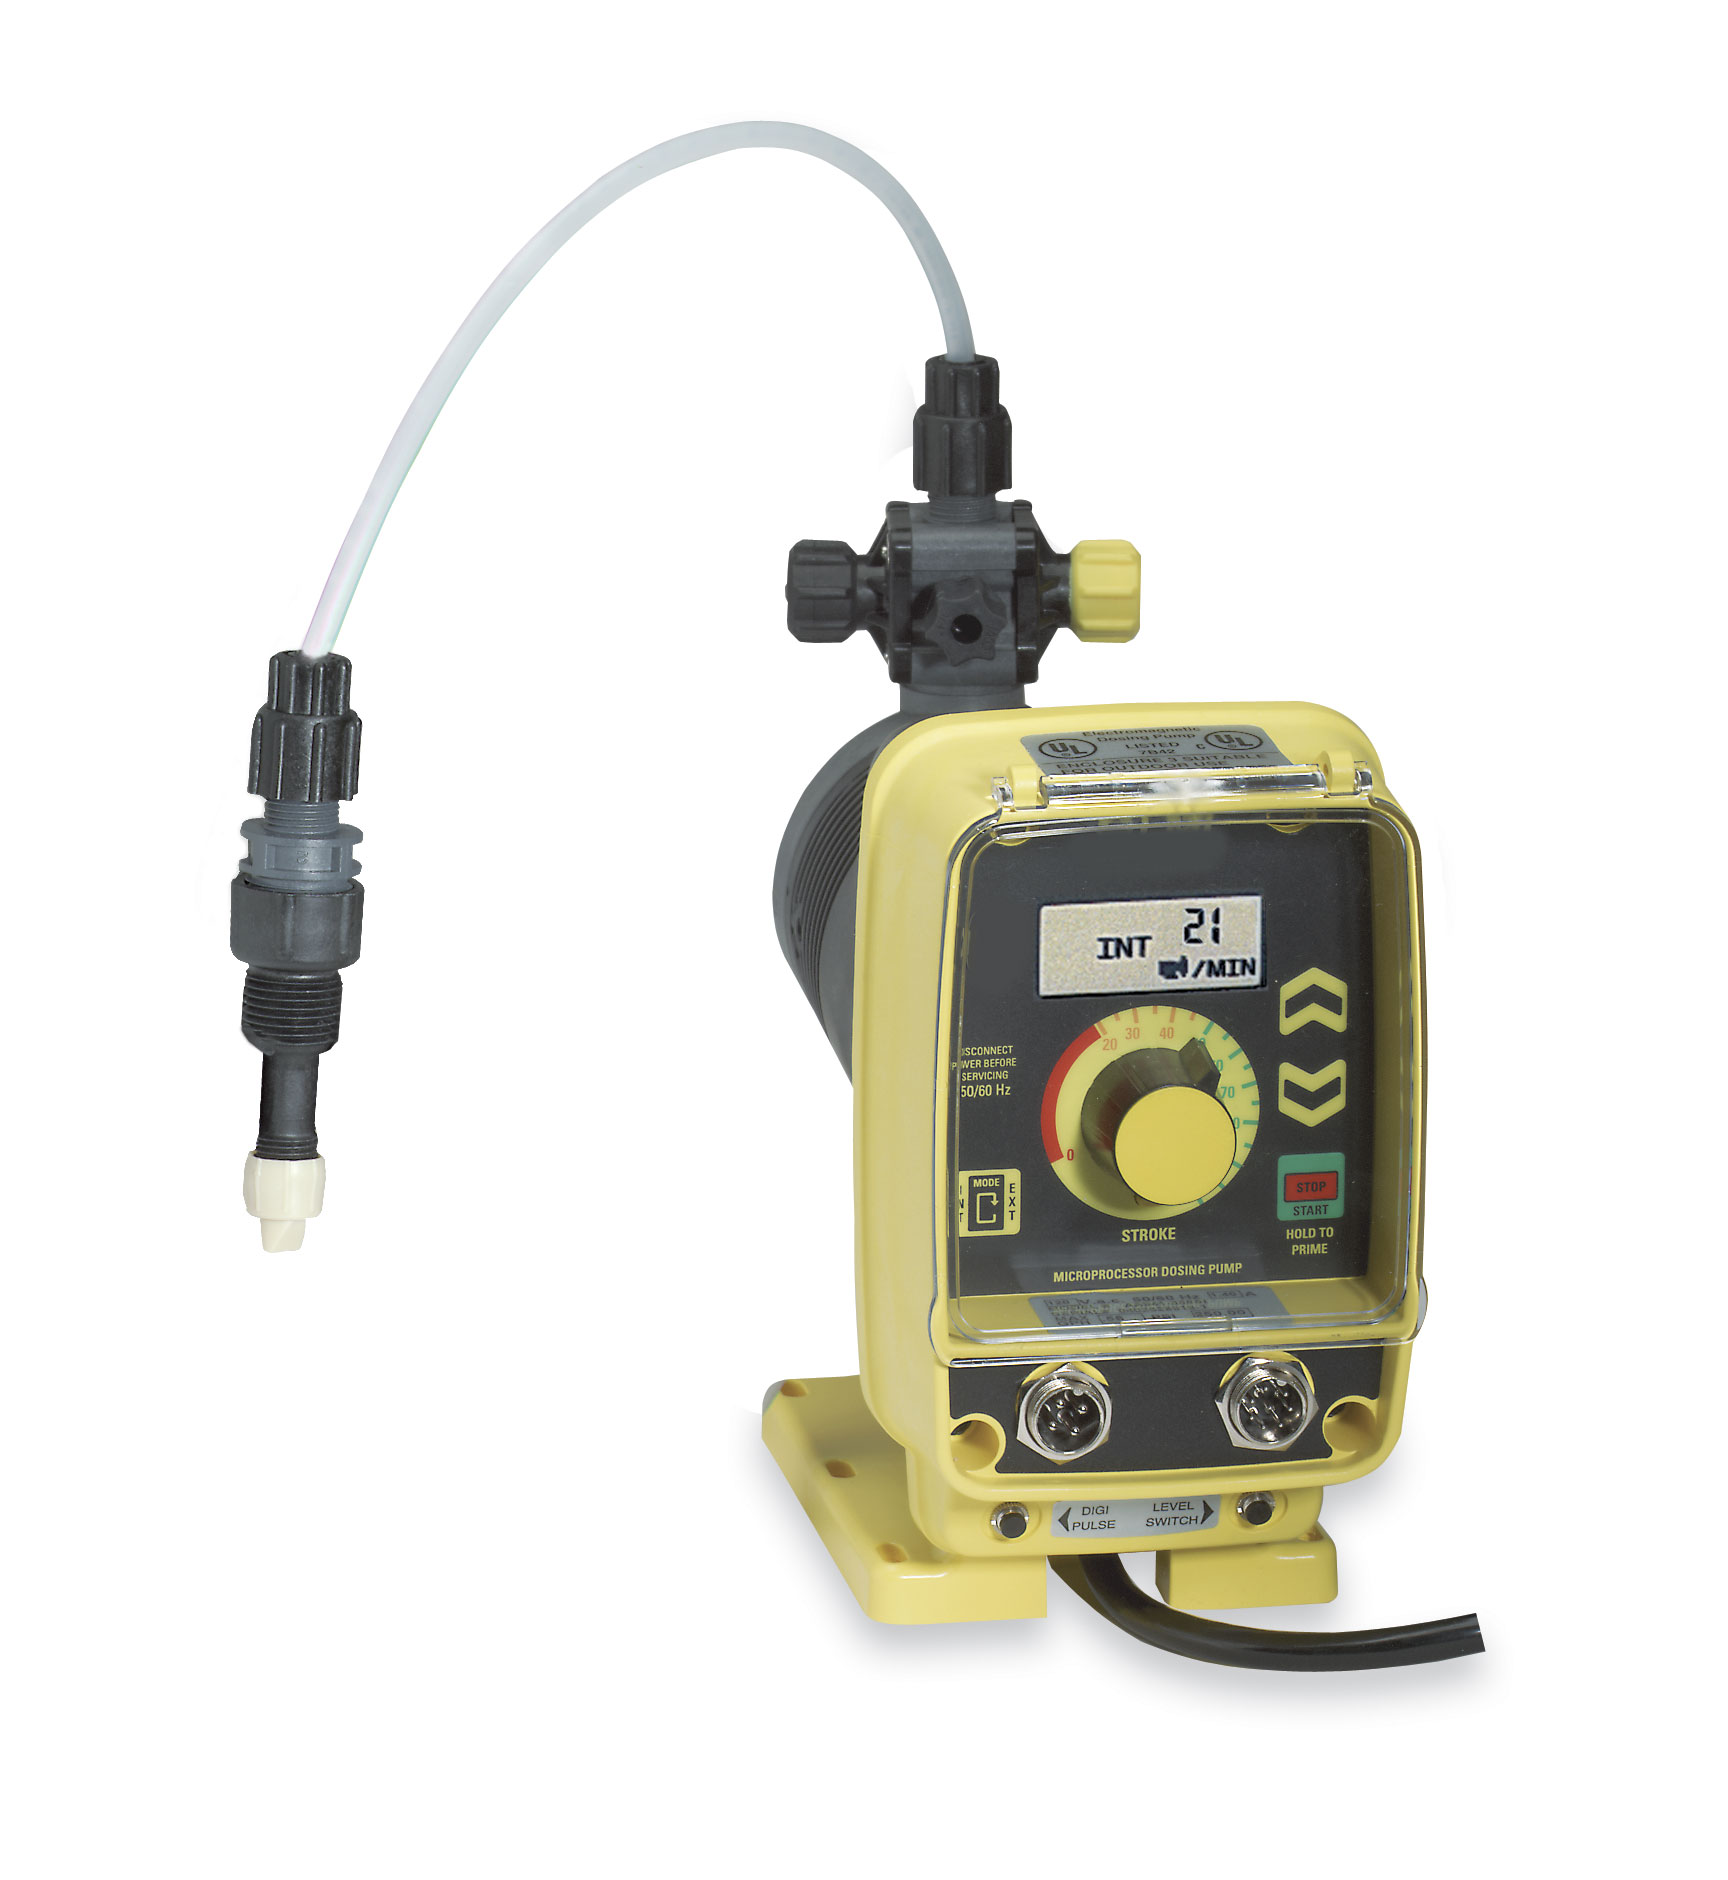 AA952 398SI Digital Remote Control Solenoid Diaphragm Metering Pump  #968B35